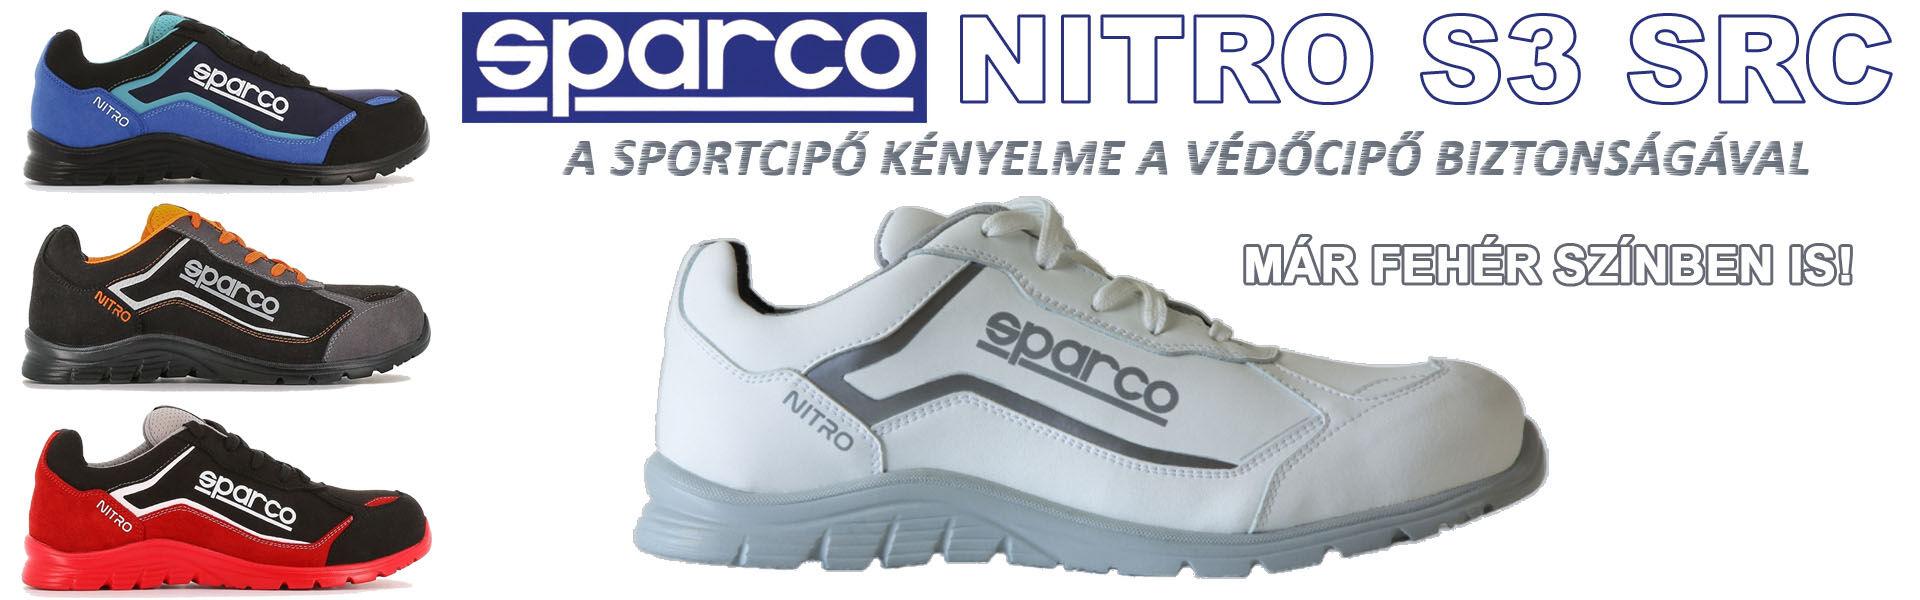 Sparco Nitro fehér